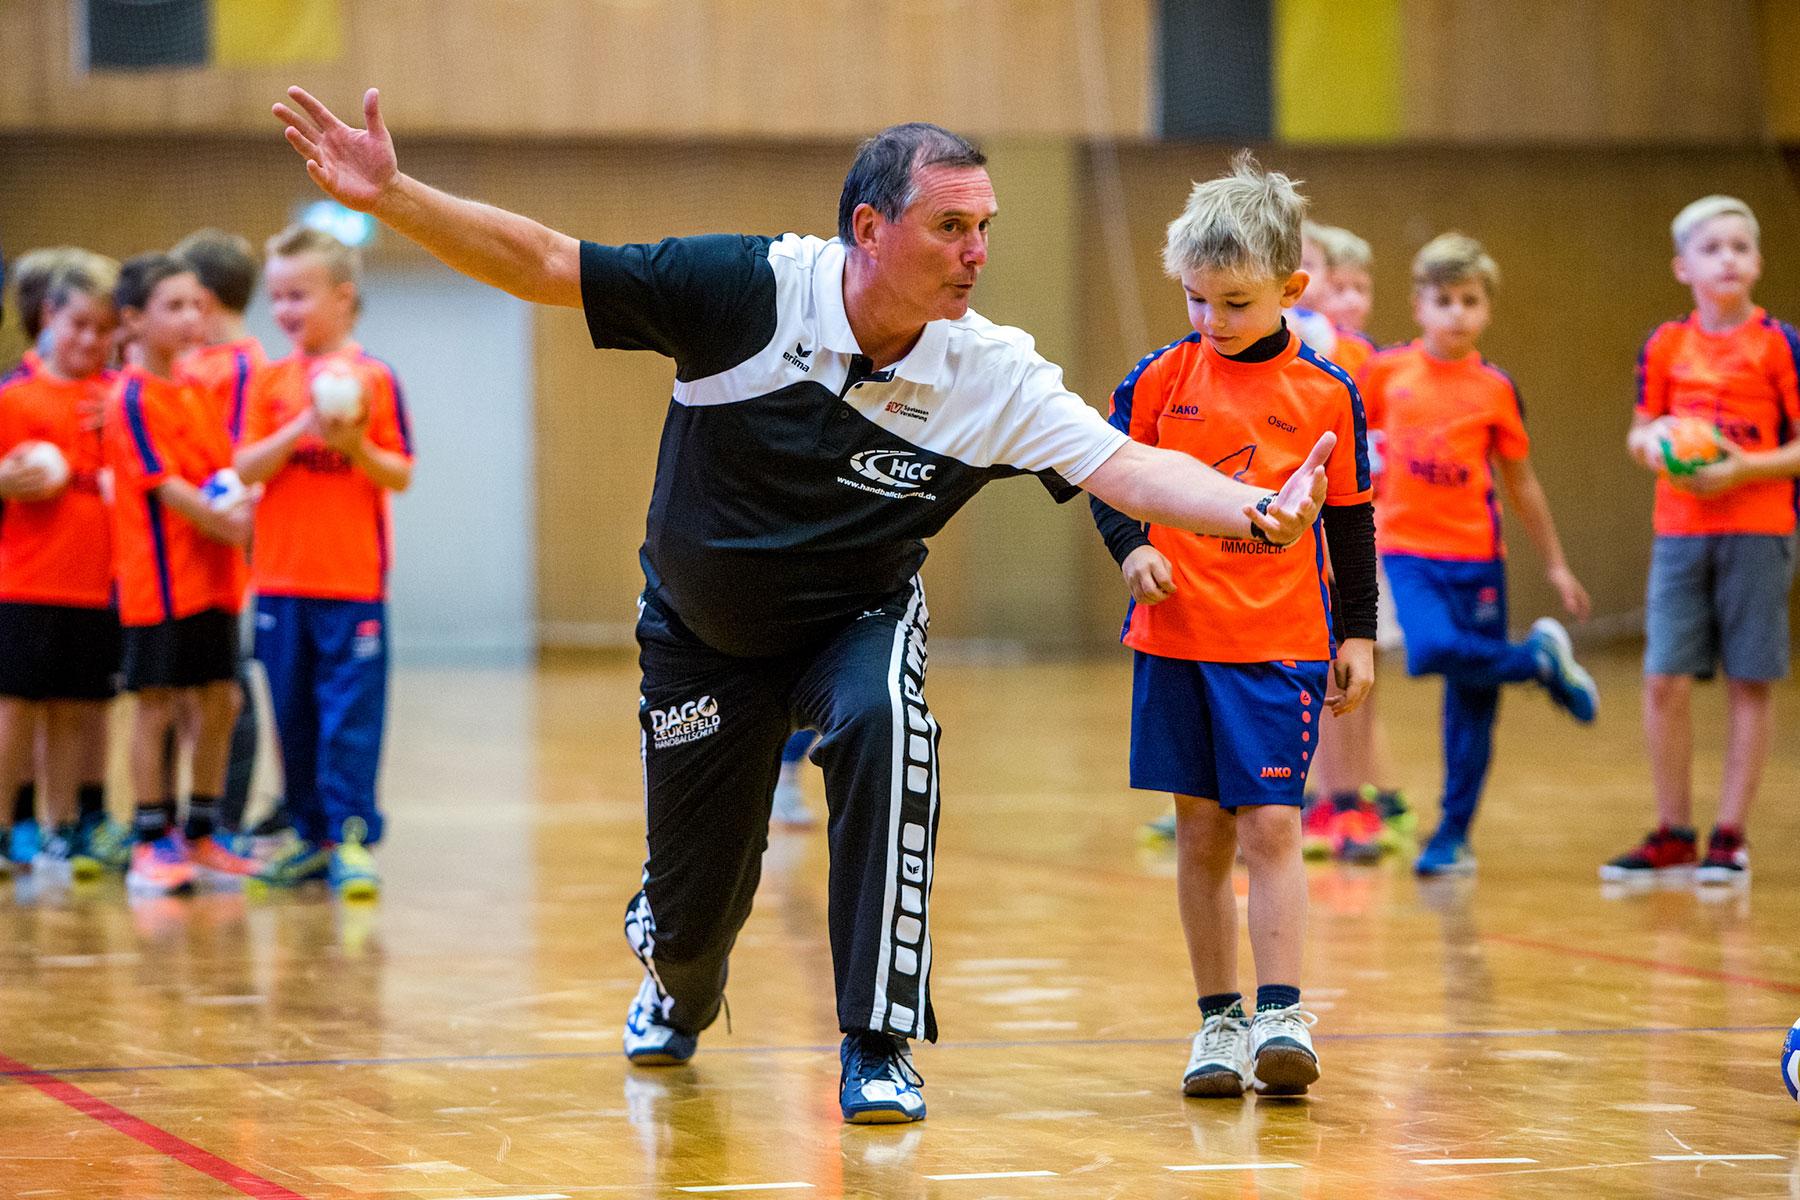 201809_Handballcamp_NDH (28)